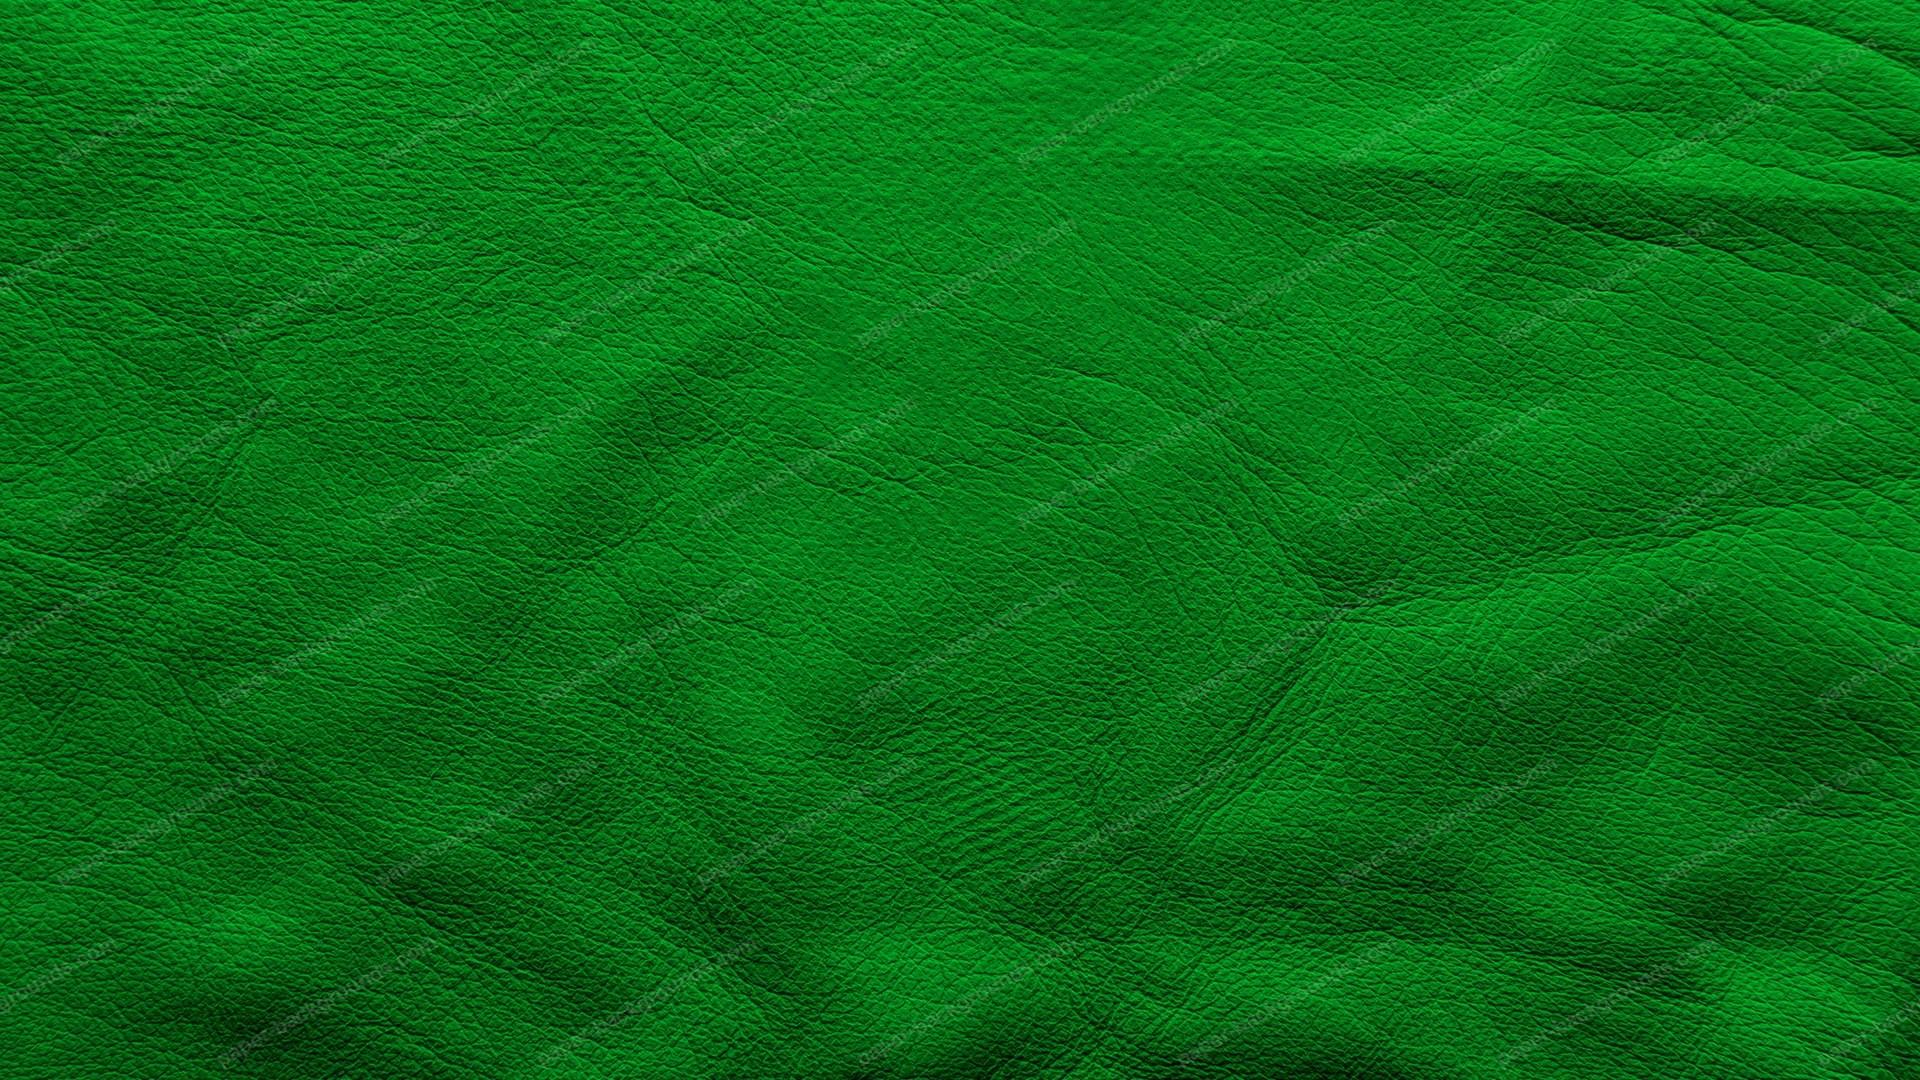 3840x2160 Dark Green Wallpaper Mobile Plain Texture Black Solid